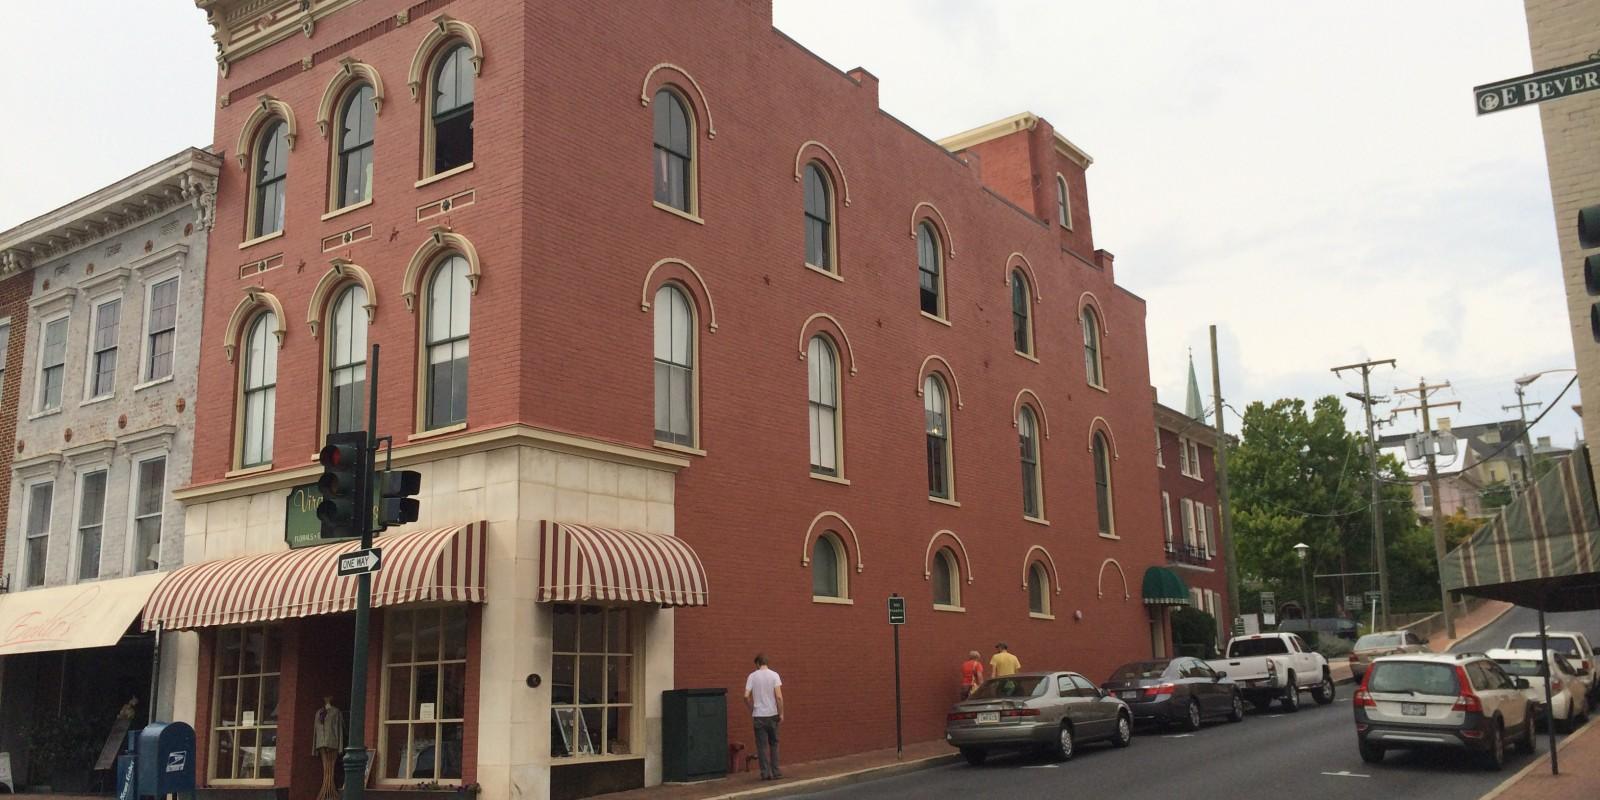 Historic Commercial – 29 East Beverley – Staunton, VA